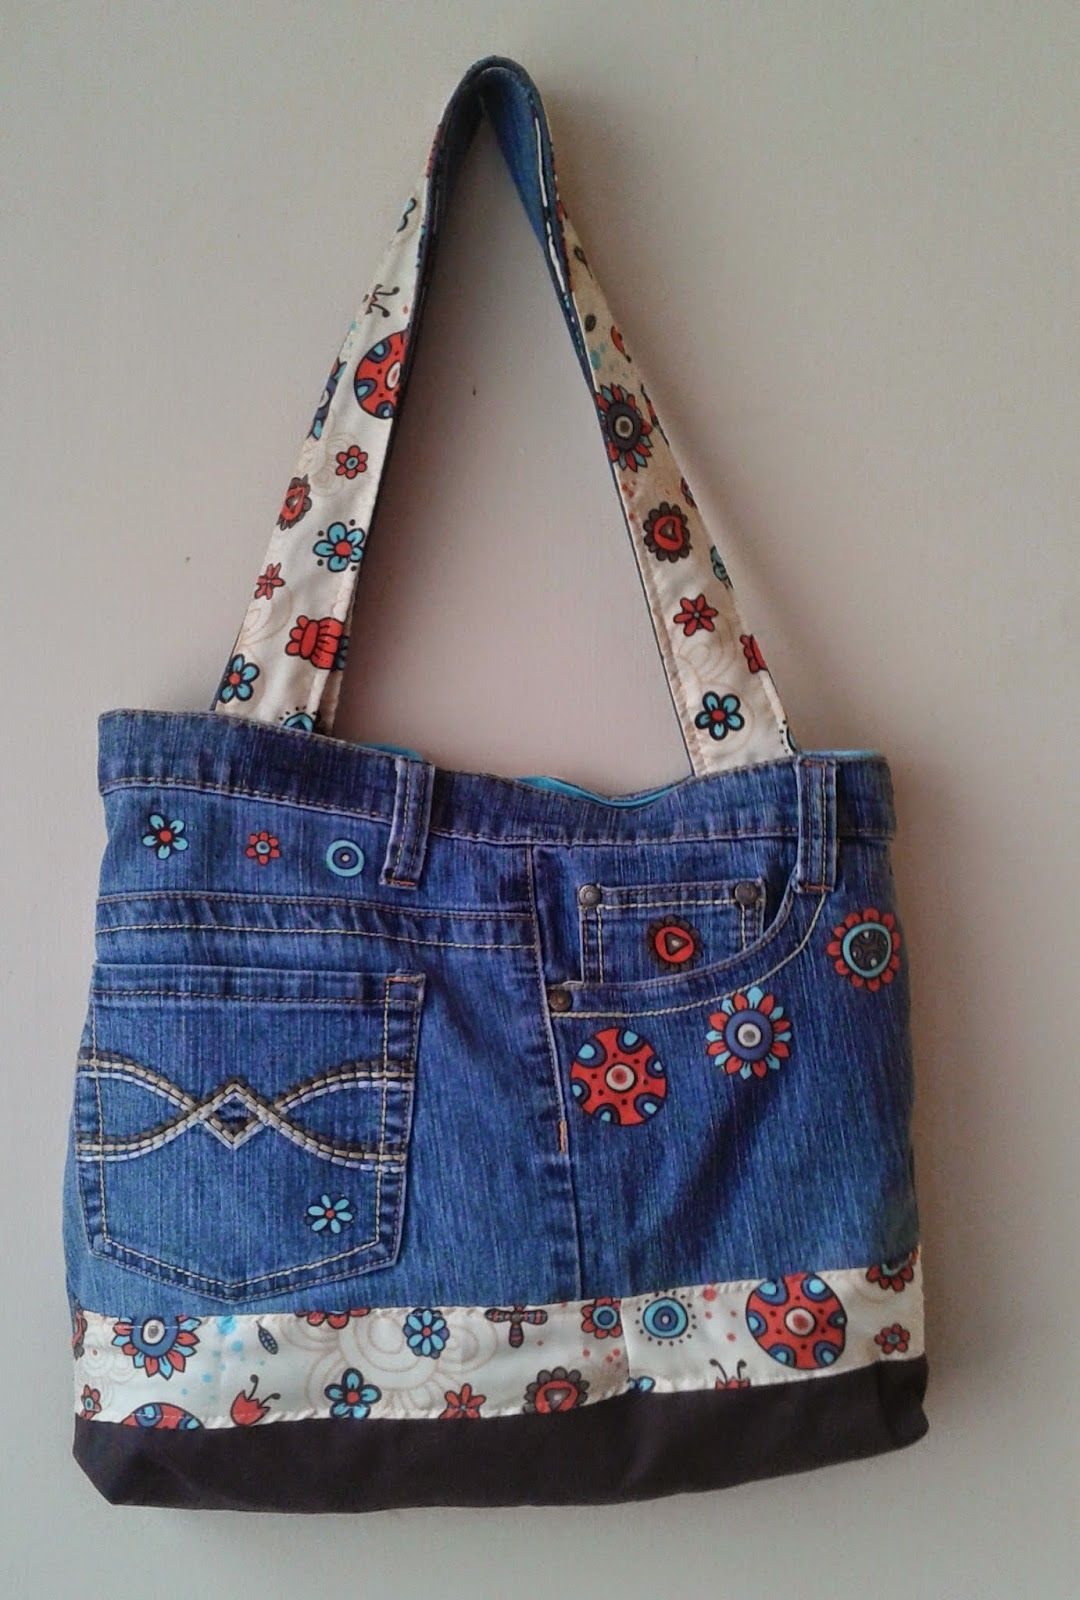 Carteras de Jeans Reciclados ~ Ideas Giya | Bolsos en Jean ...